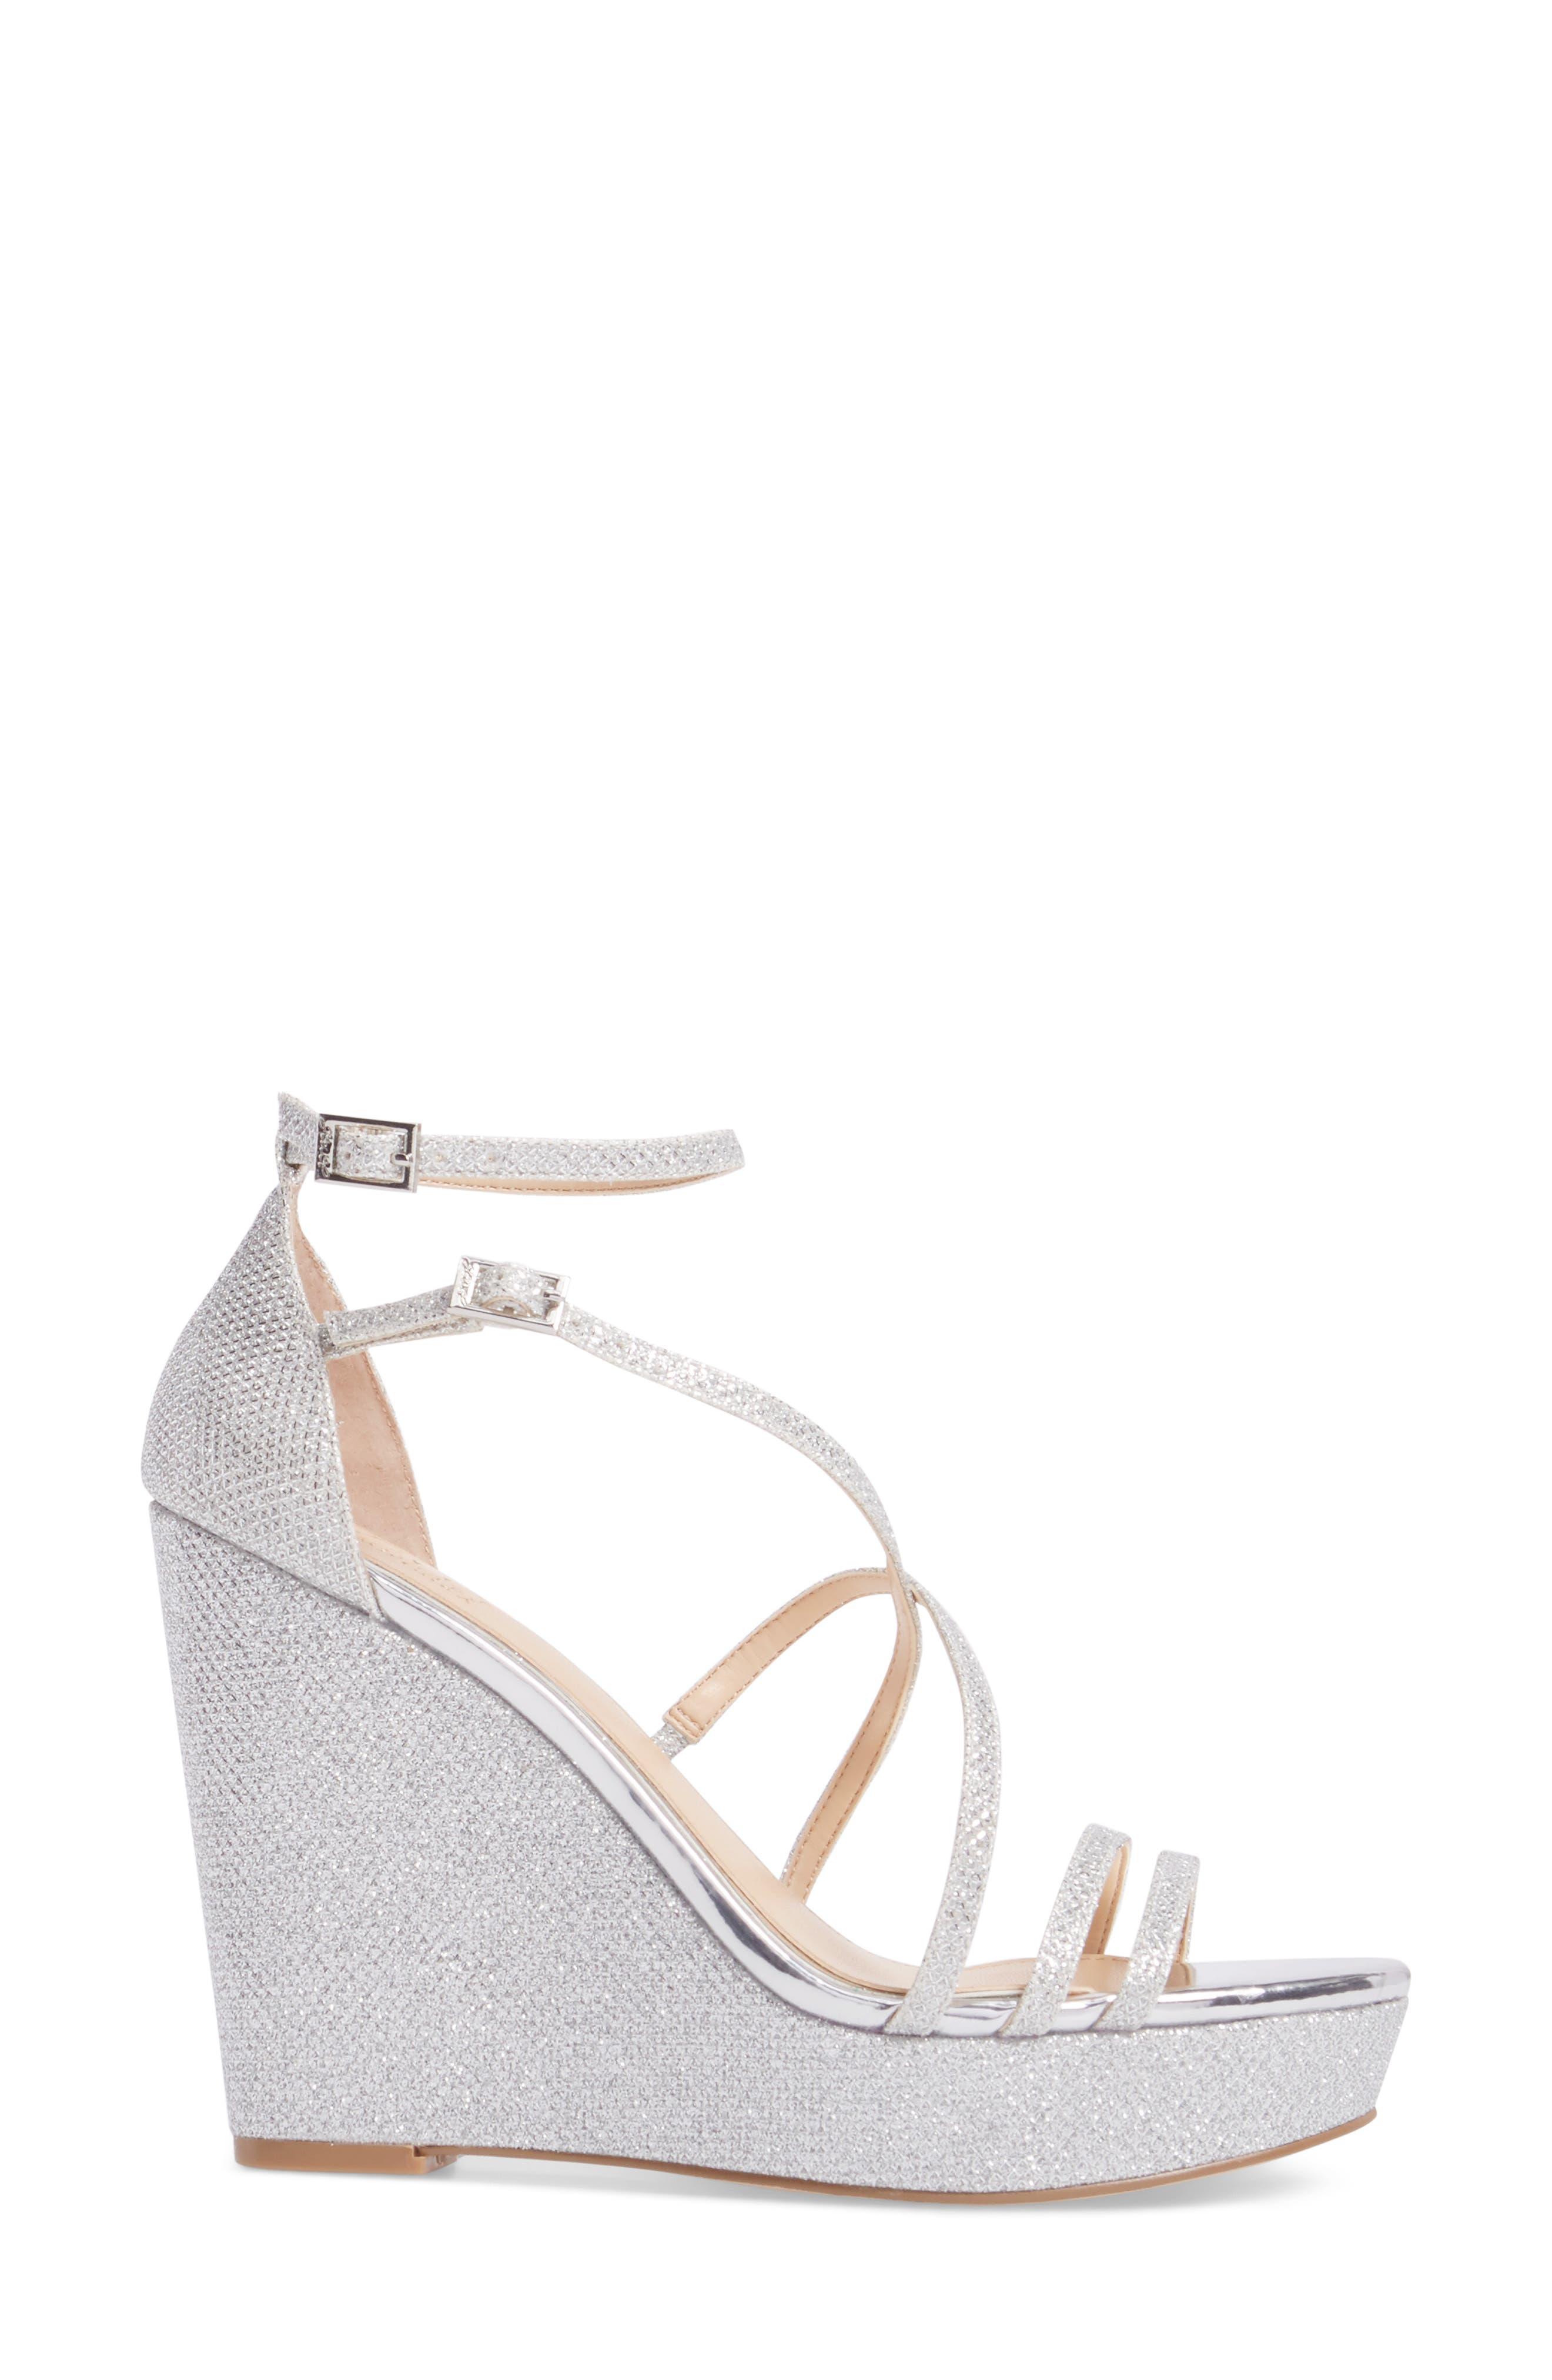 Tatsu Wedge Sandal,                             Alternate thumbnail 3, color,                             Silver Glitter